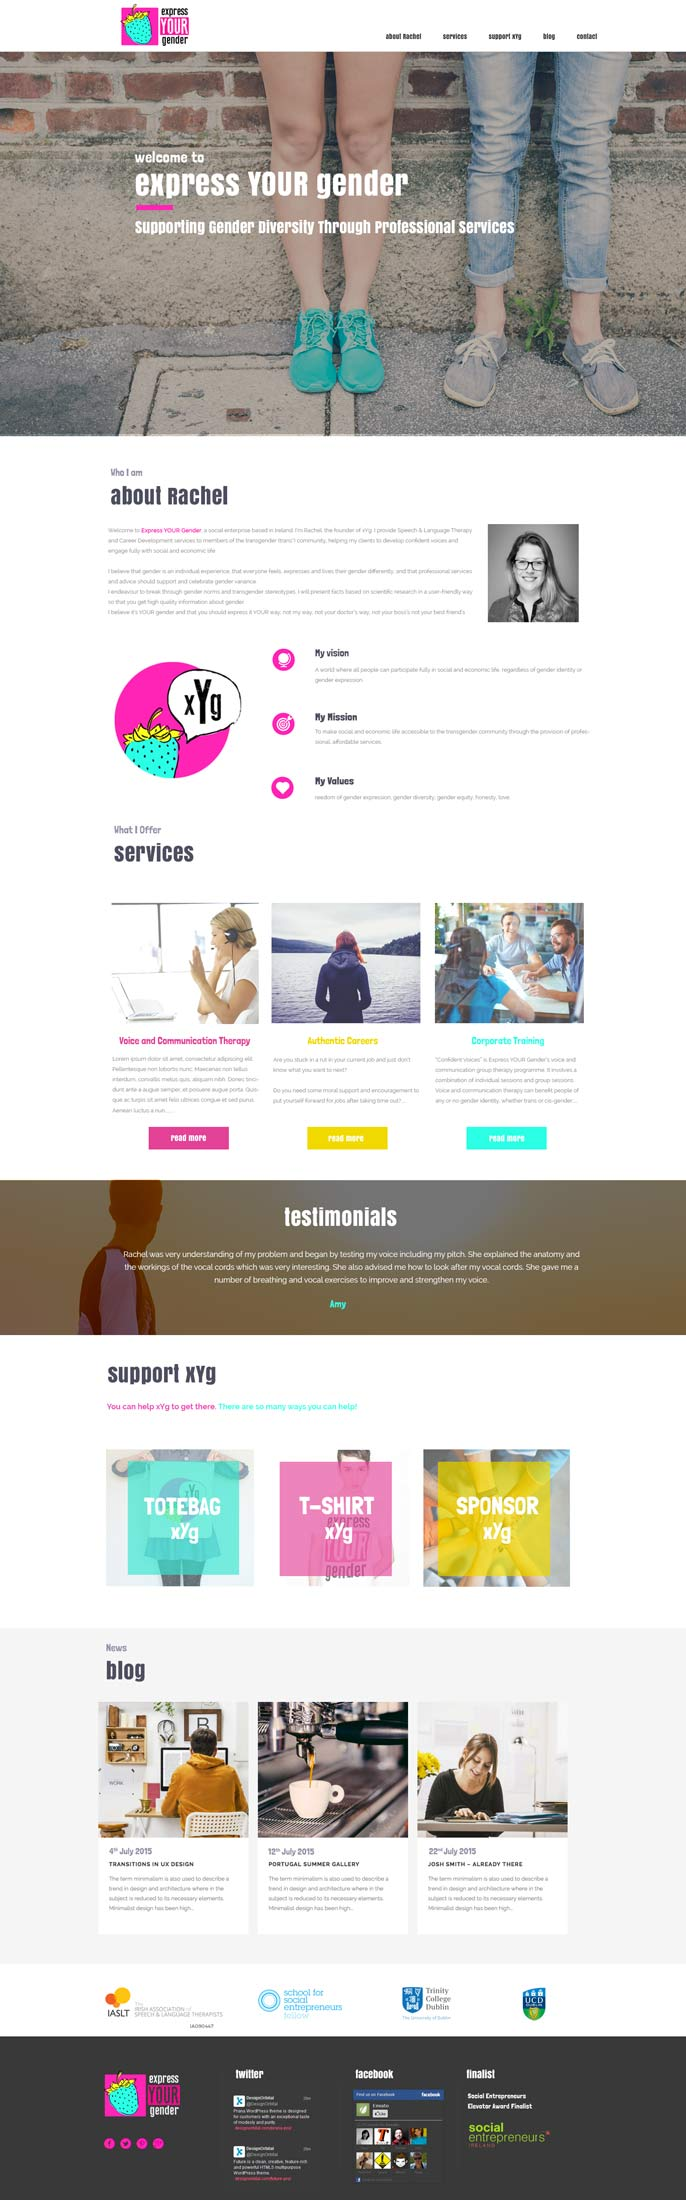 Web Design - Dublin - ExpressYourGender.ie